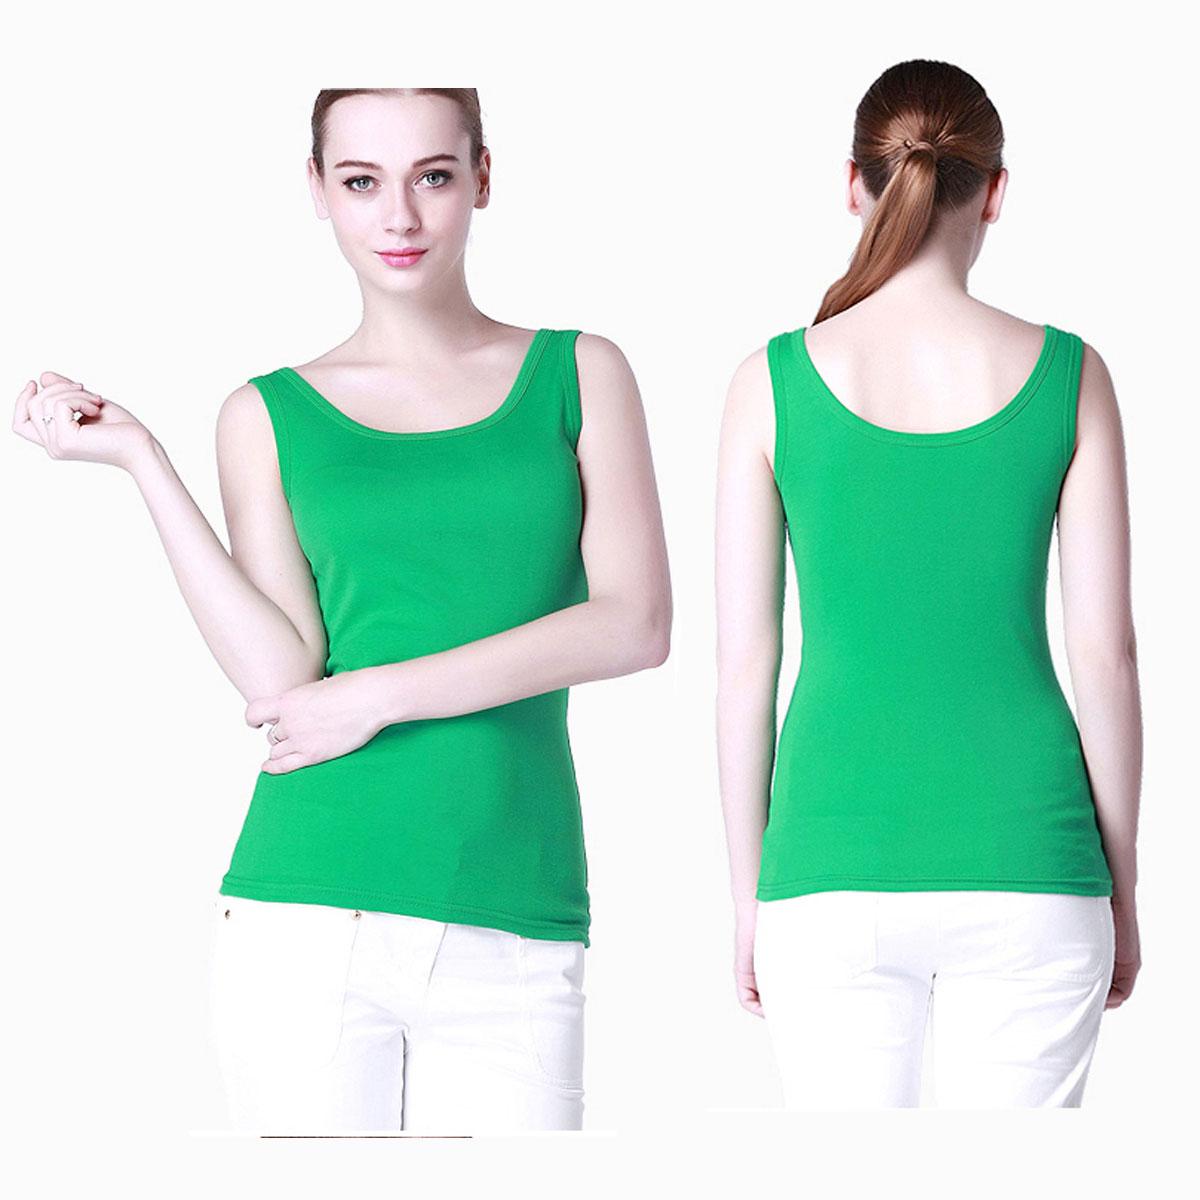 Double u shaped Casual tight tanks Women's Sleeveless Tank Tops modal cotton no Sleeve T-Shirt Vest undershirt custom logo print